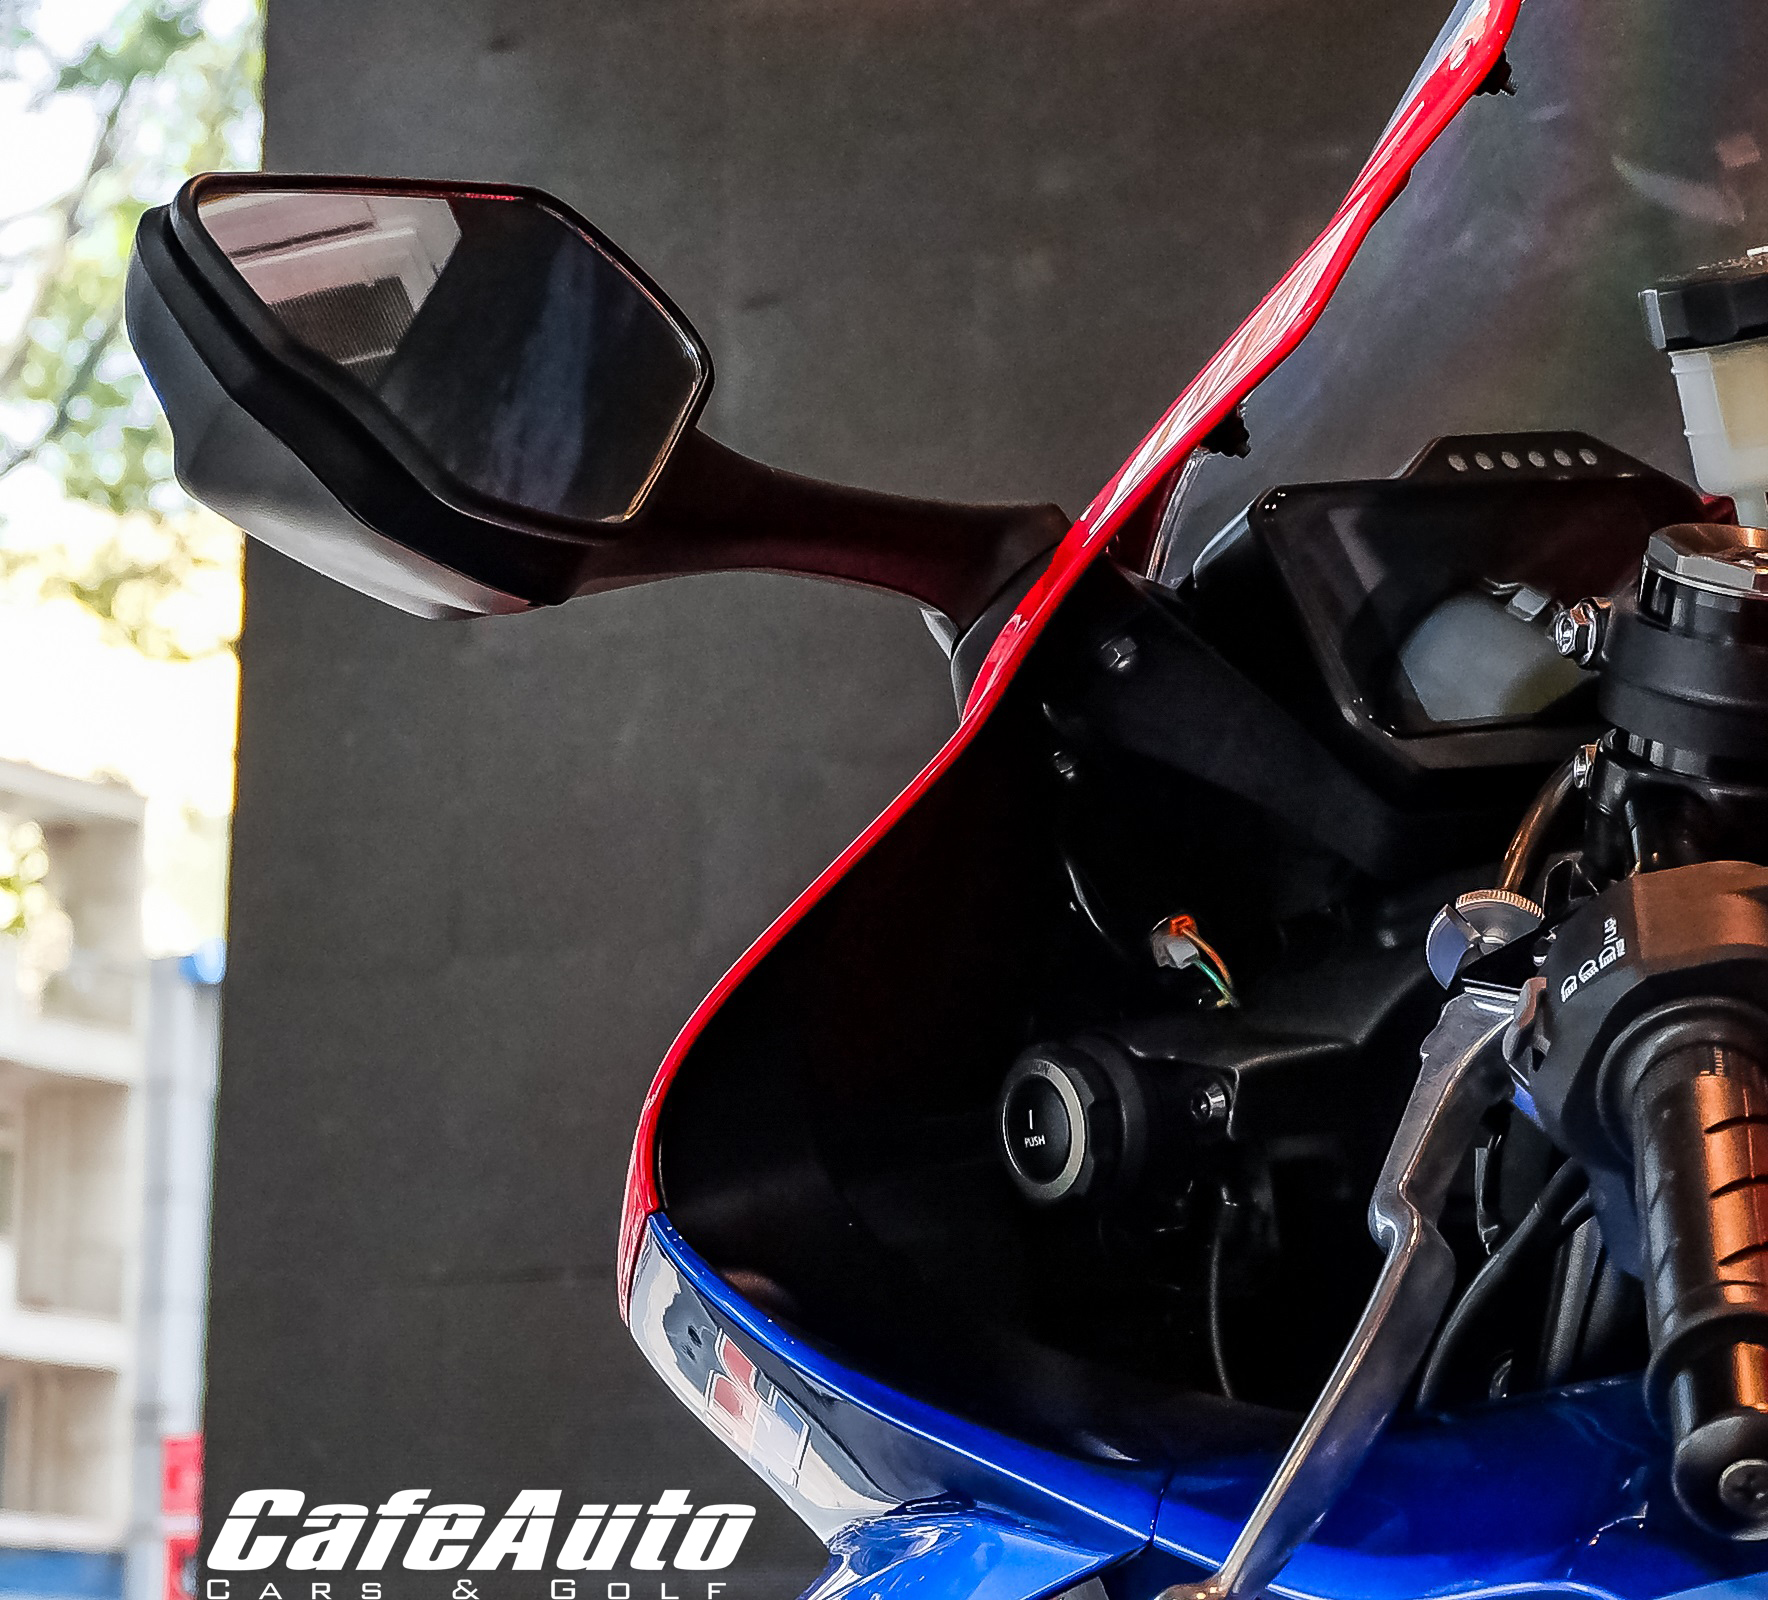 CBR1000RRR-Cafeautovn-9